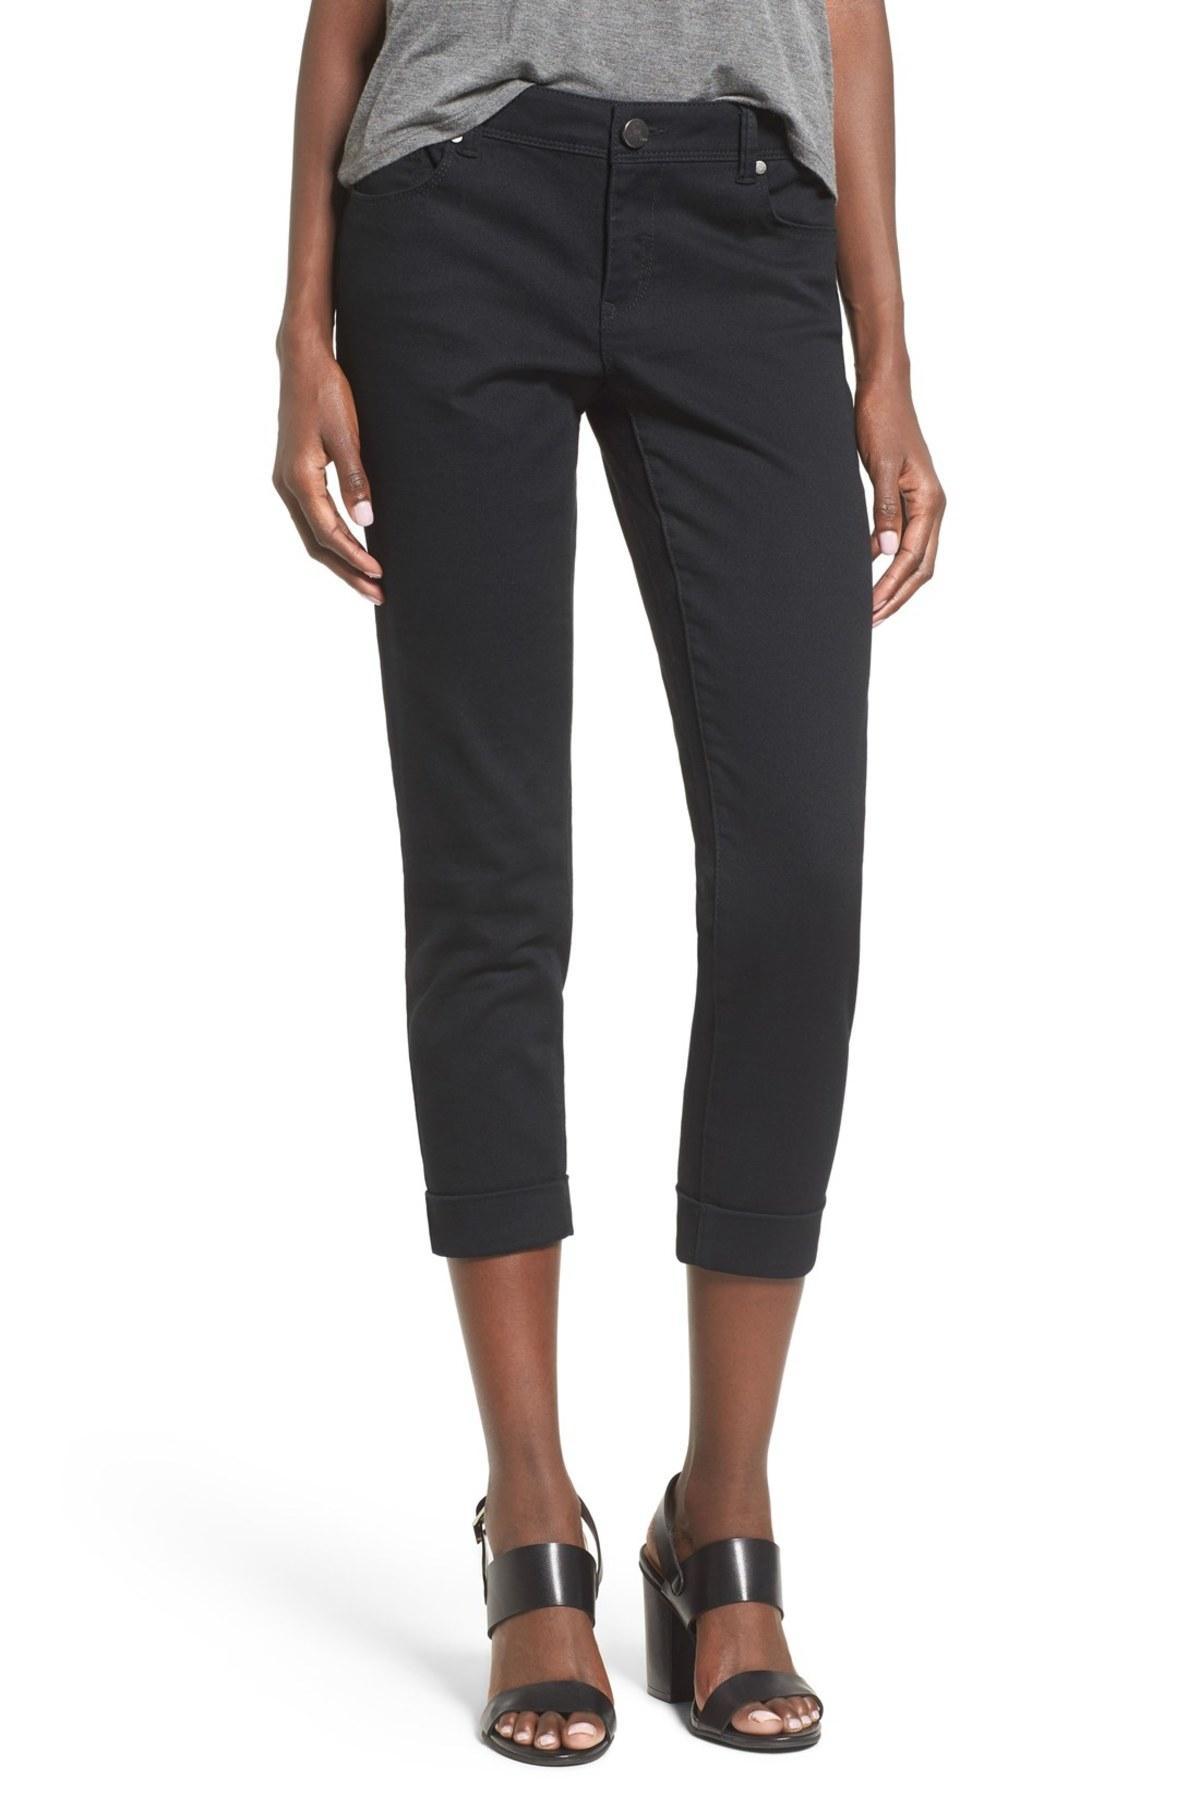 1822 denim Crop Skinny Jean in Black | Lyst - photo#44